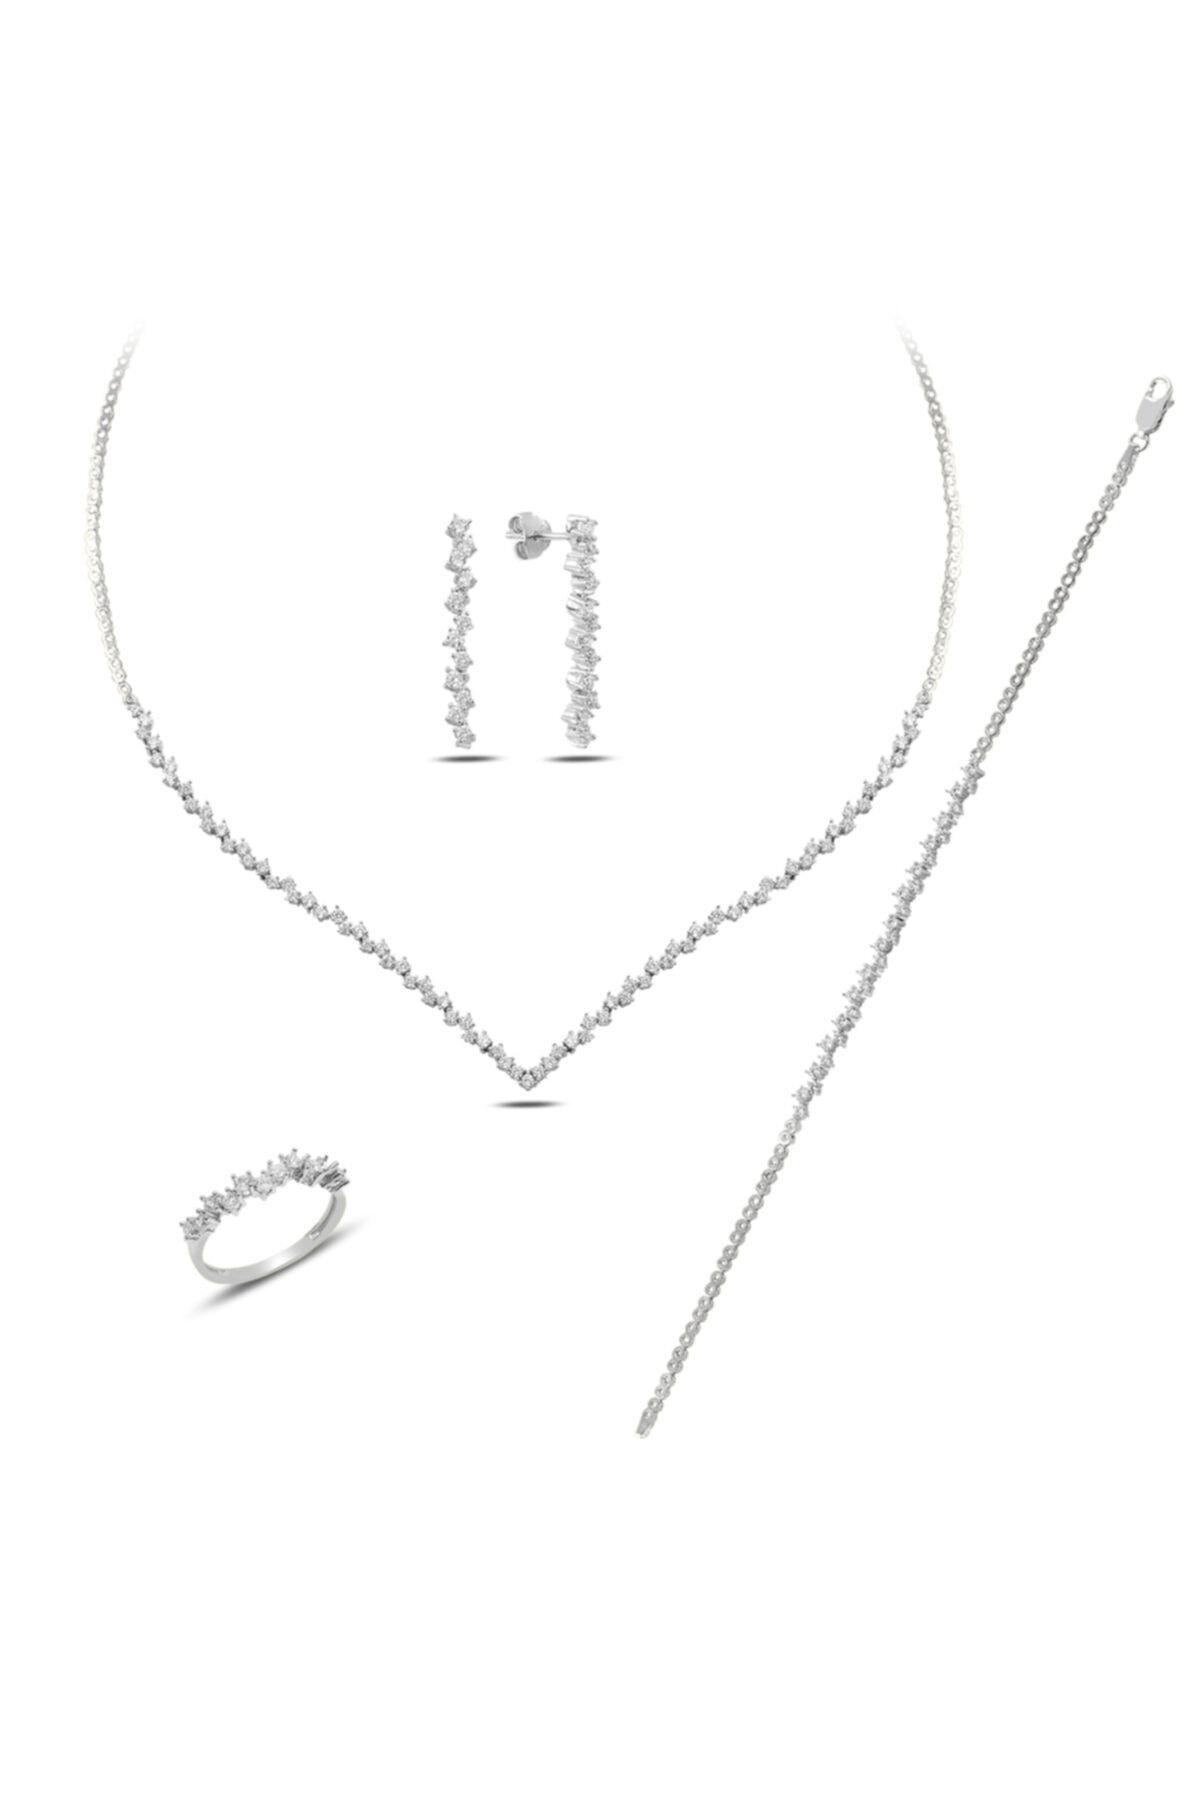 BARIŞ TAKI Kadın 925 Ayar Gümüş Pırlanta Montür Su Yolu Düğün Seti 2